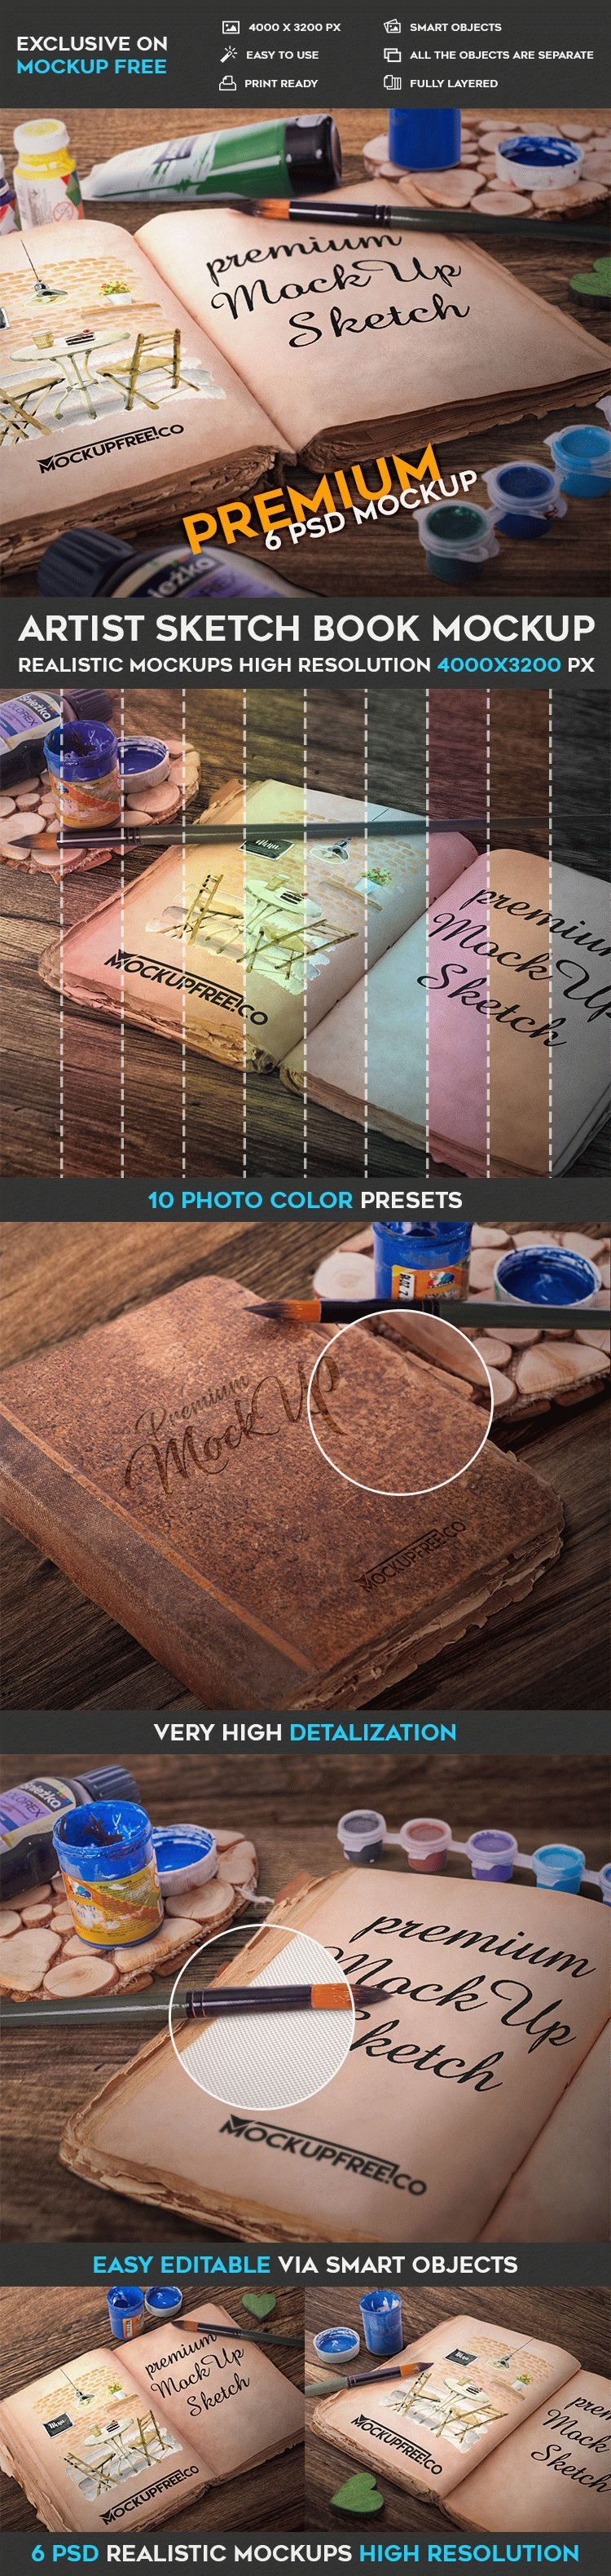 bigpreview_artist-sketch-book-6-premium-psd-mockups